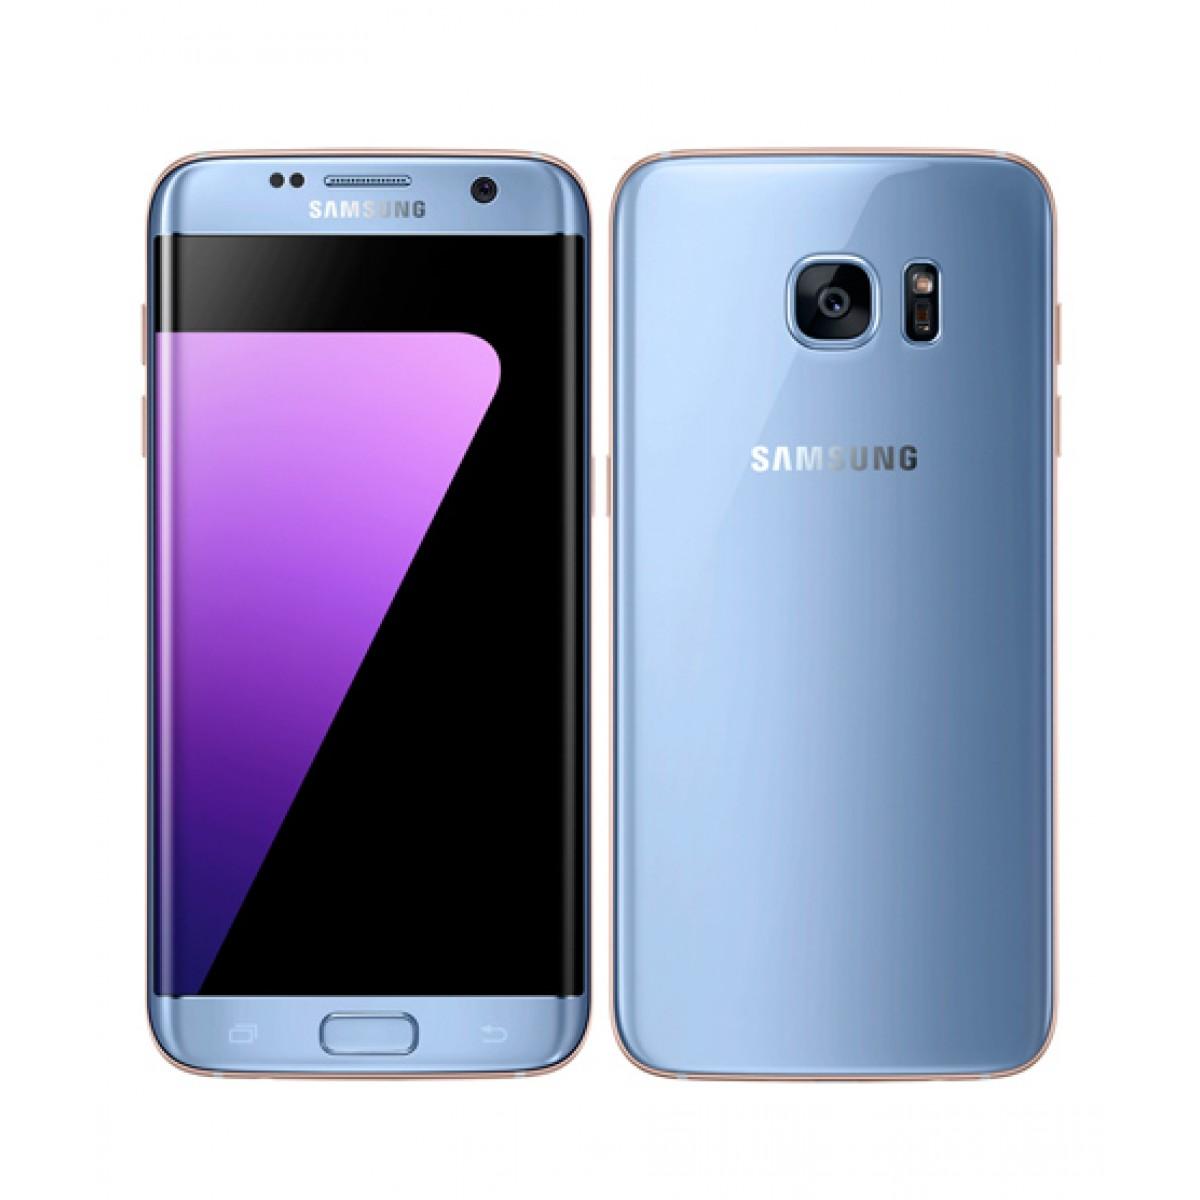 Samsung Galaxy S7 Edge 32GB 4G Dual Sim Blue (G935FD)